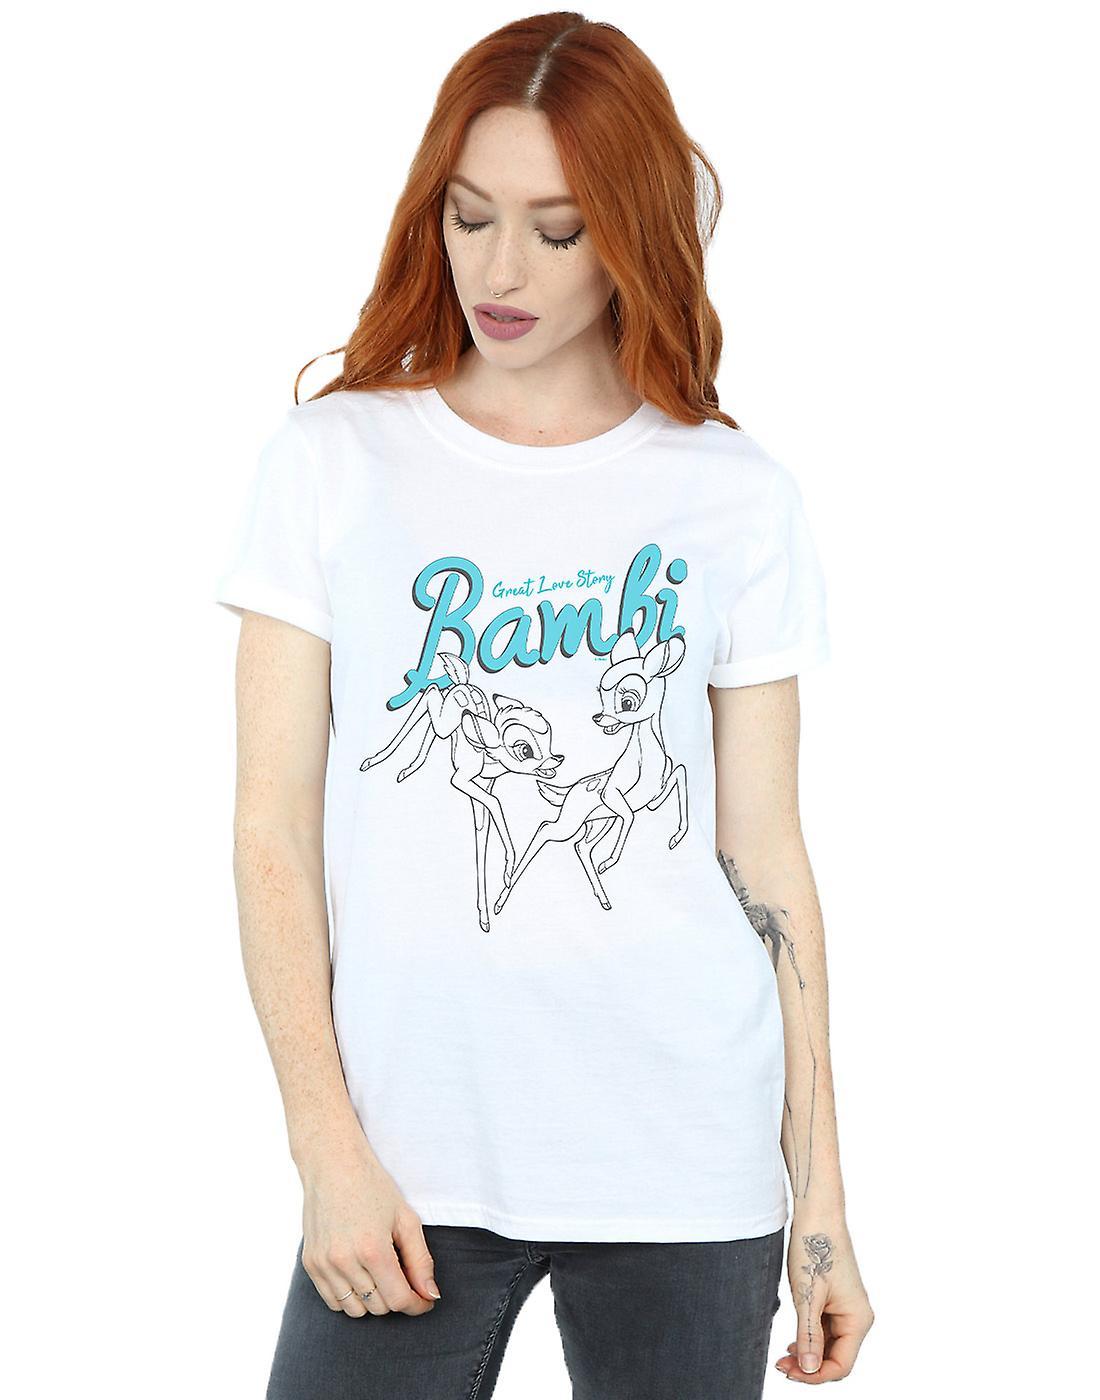 Disney Women's Bambi Great Love Story Boyfriend Fit T-Shirt